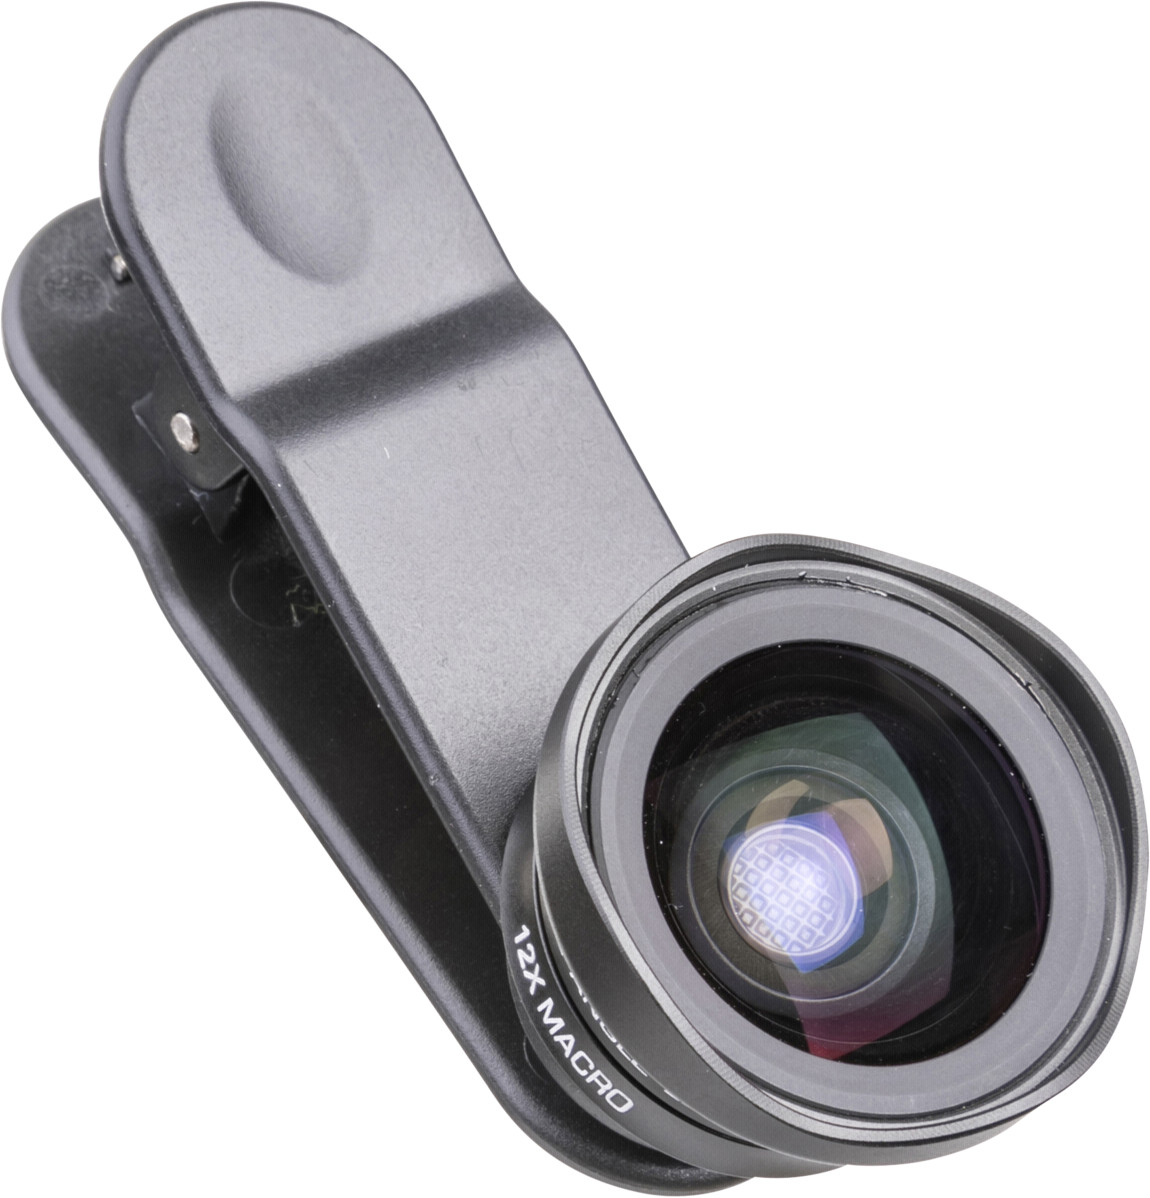 Image of miggö Pictar Smart Lens Macro 16mm